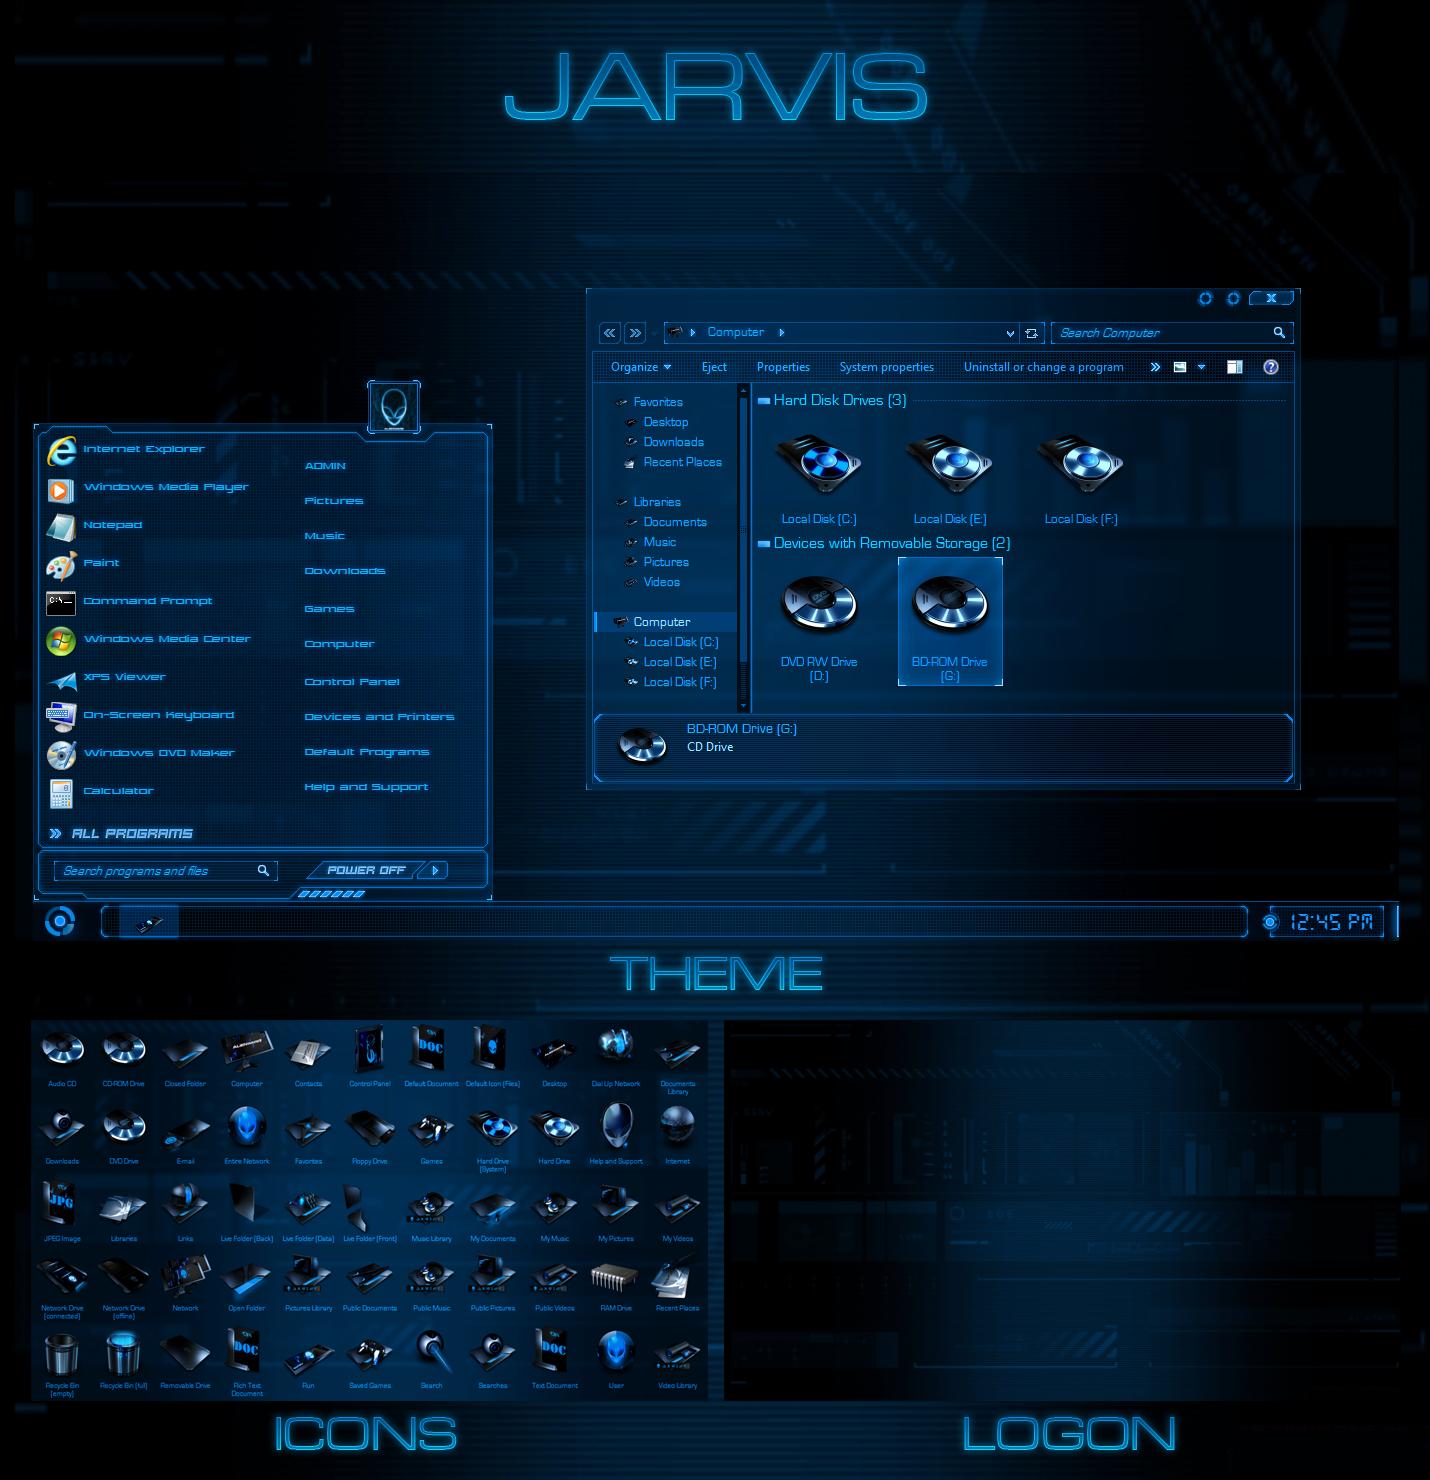 Animated 3d wallpaper jarvis interface -  Ultimatedesktops Jarvis Windows 7 Transformation Pack By Ultimatedesktops